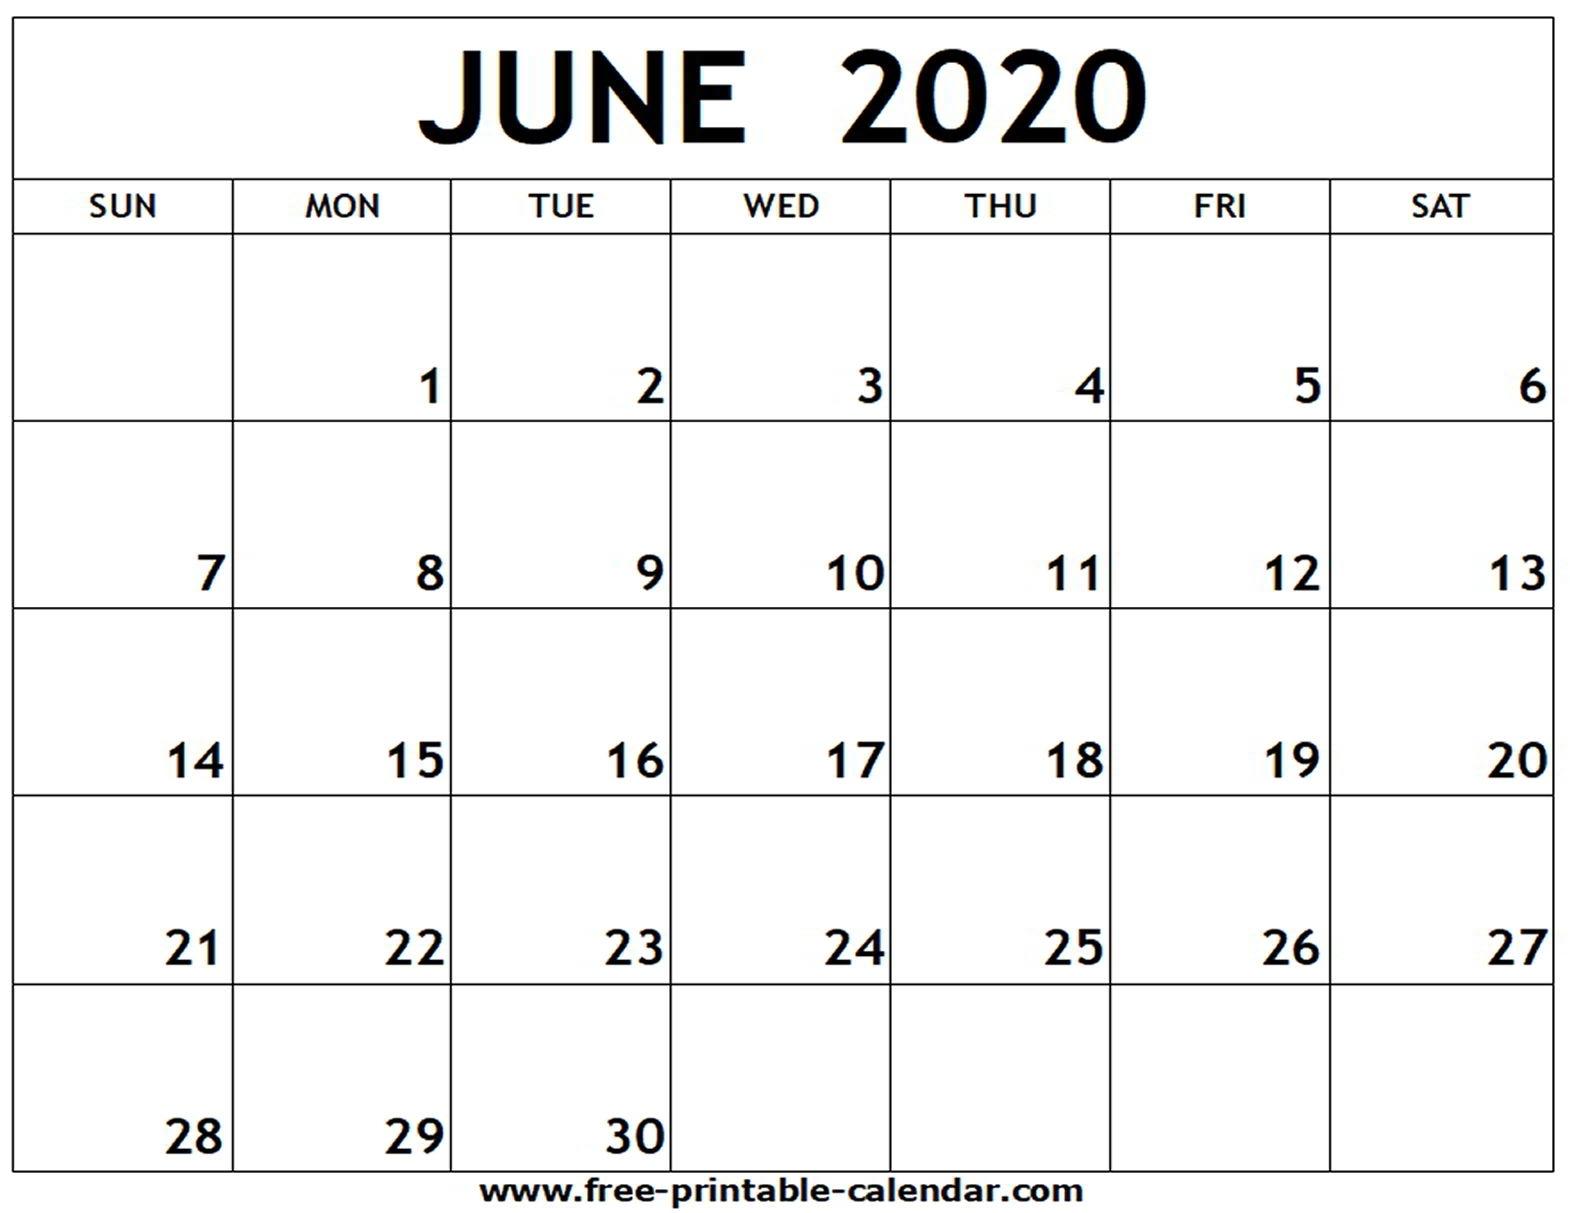 June 2020 Printable Calendar - Free-Printable-Calendar